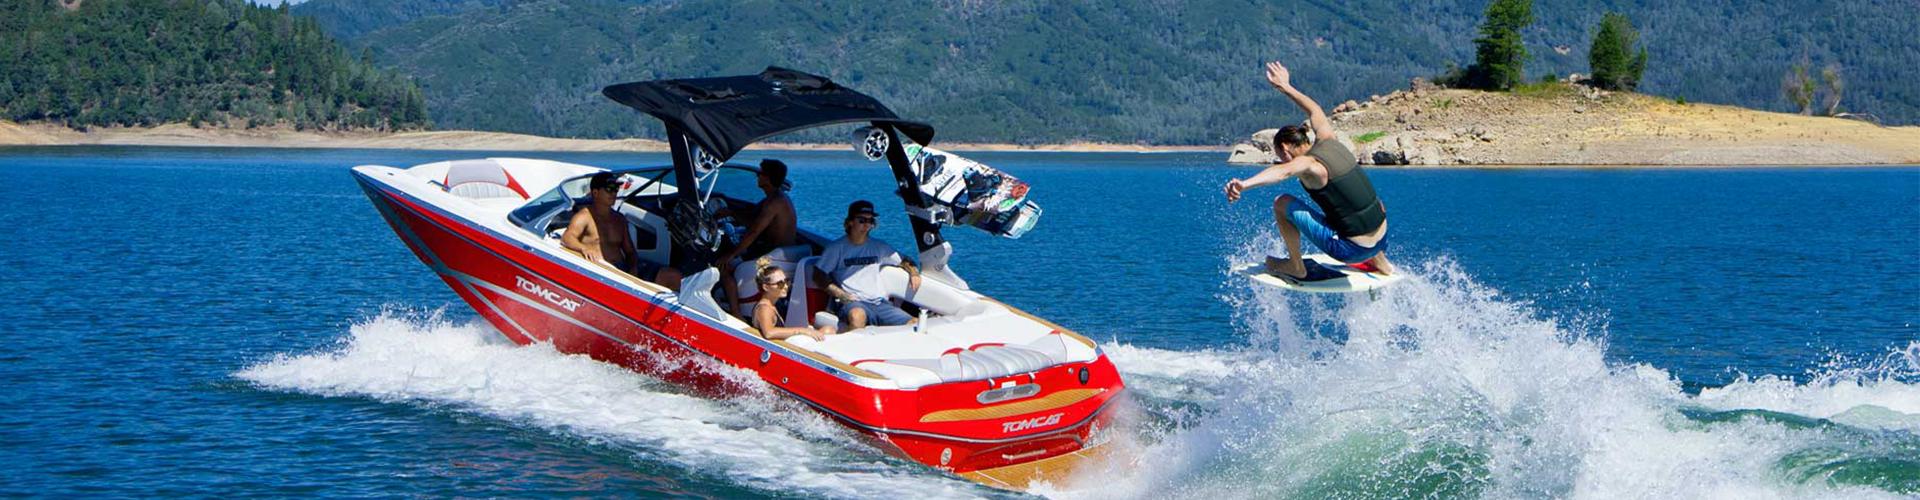 MB Sports Boats